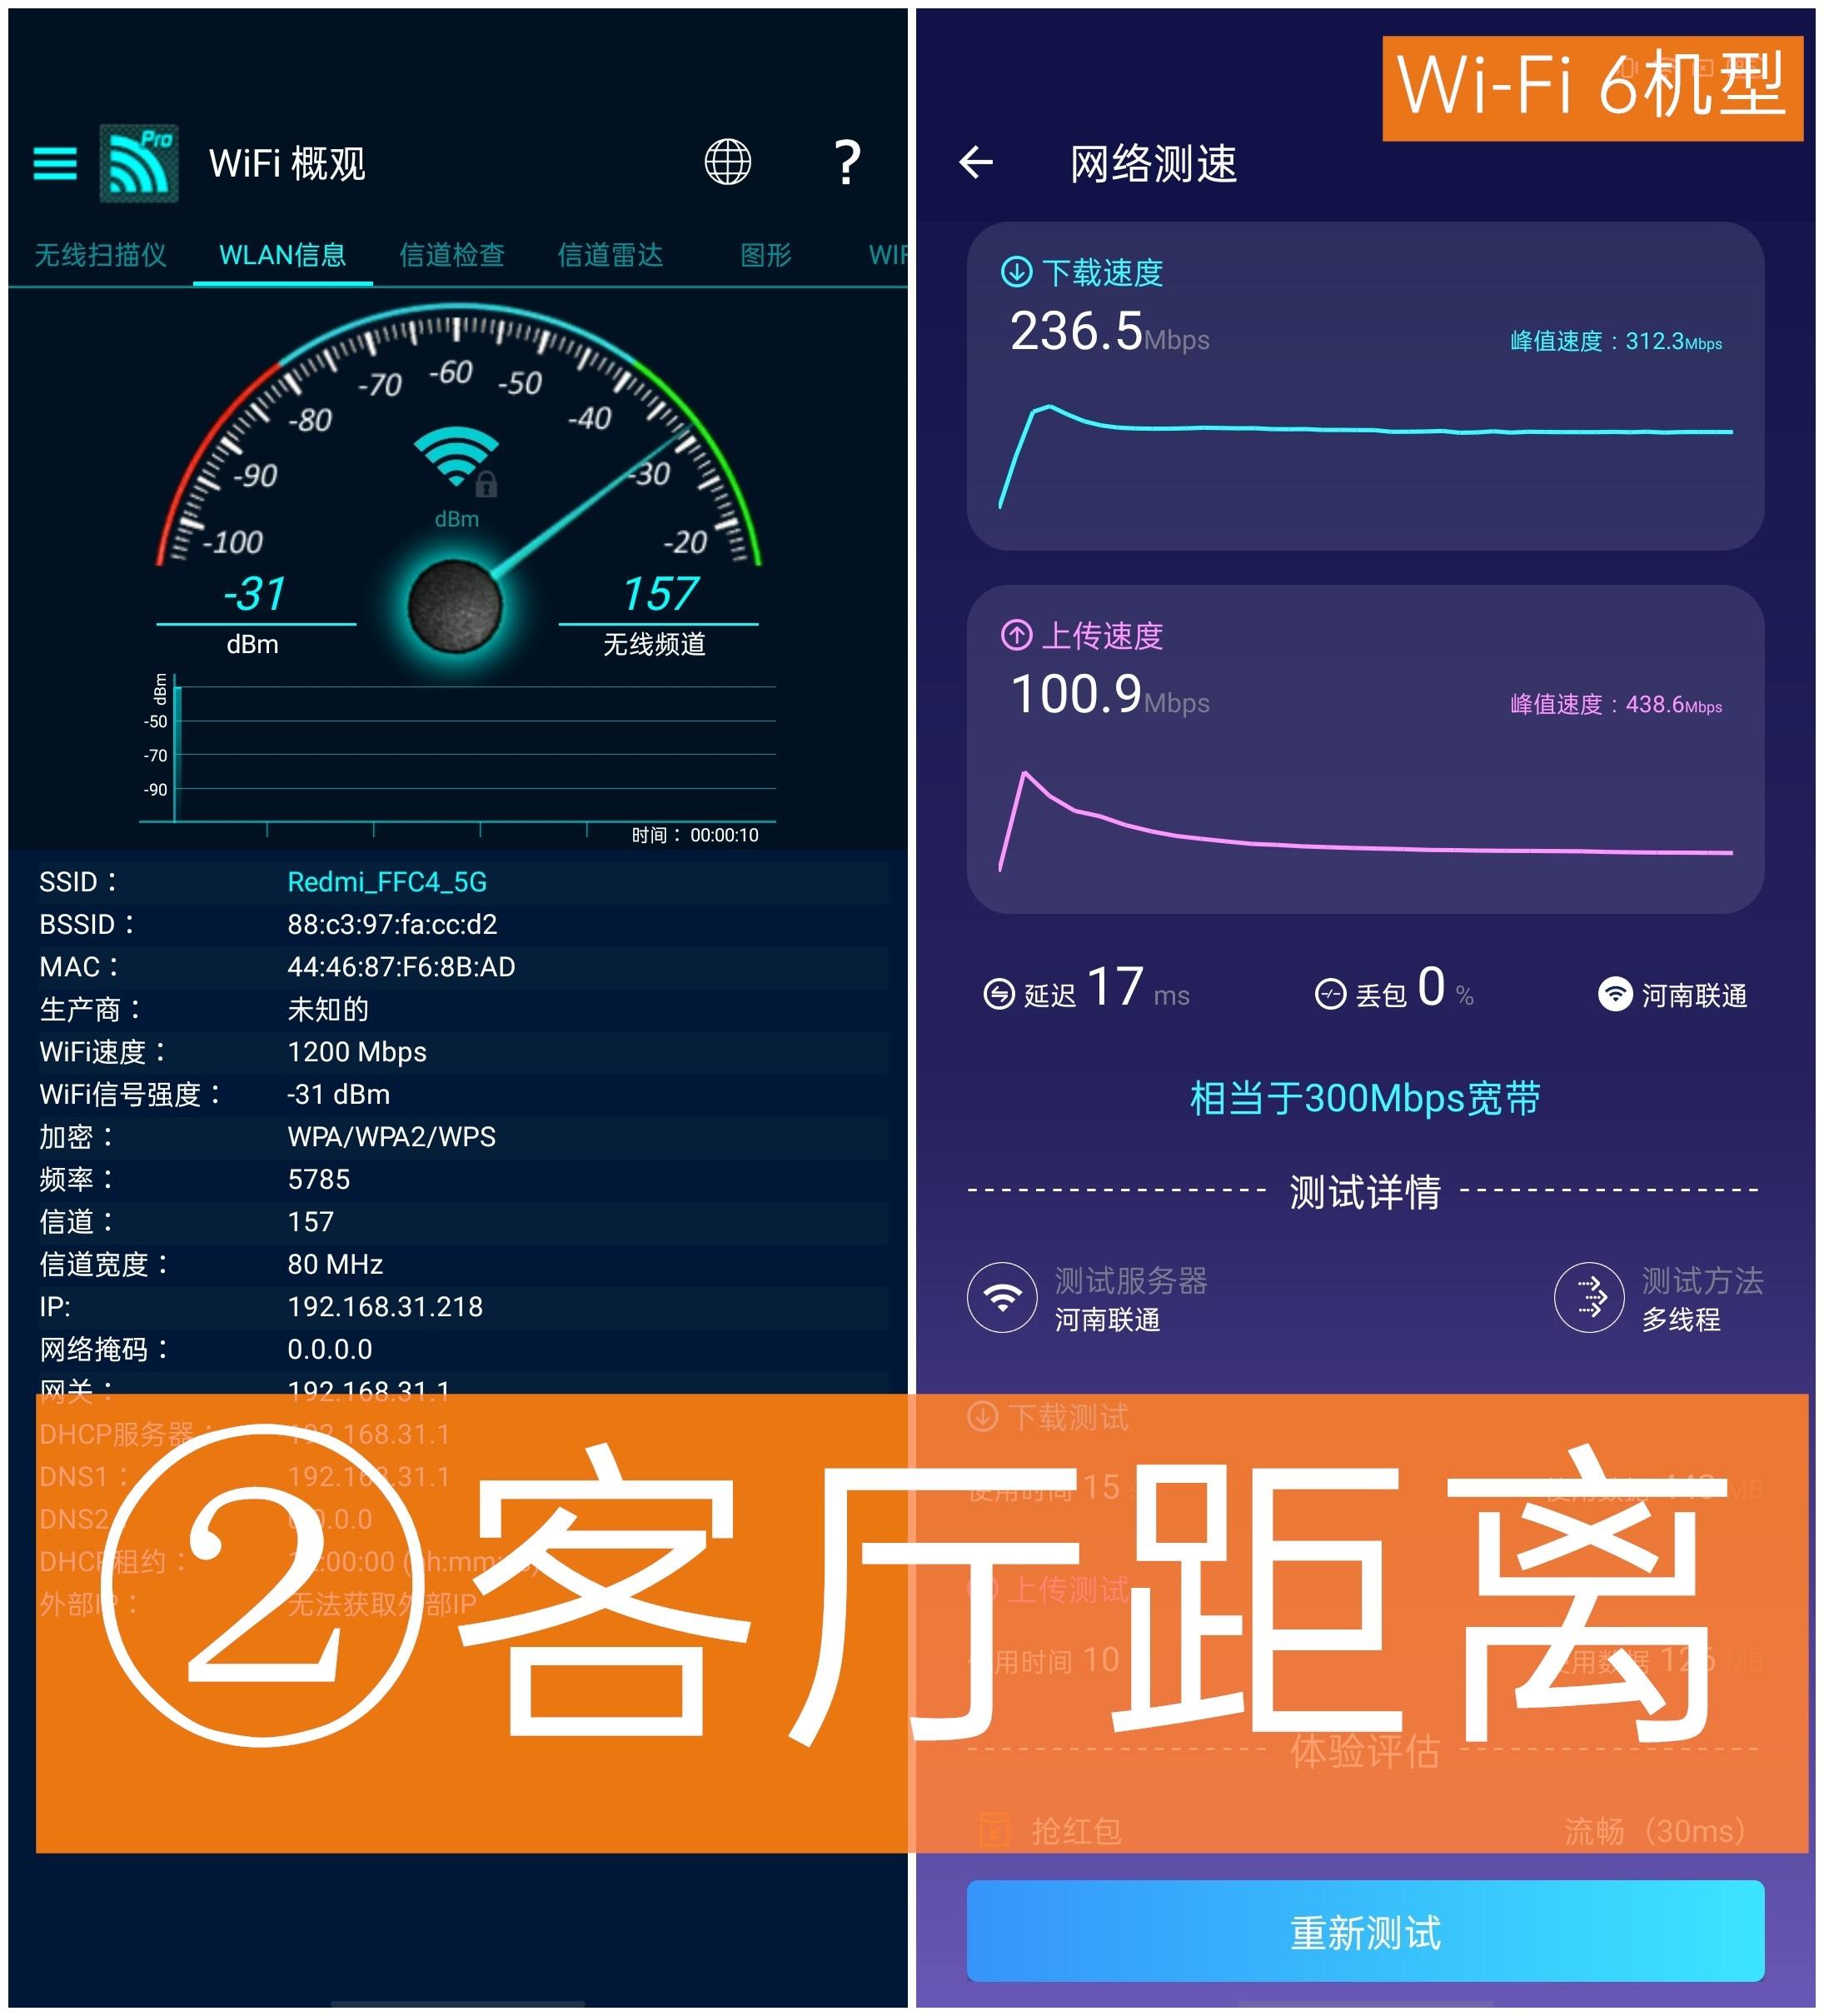 Redmi首款Wi-Fi 6路由器评测:229元同价高配